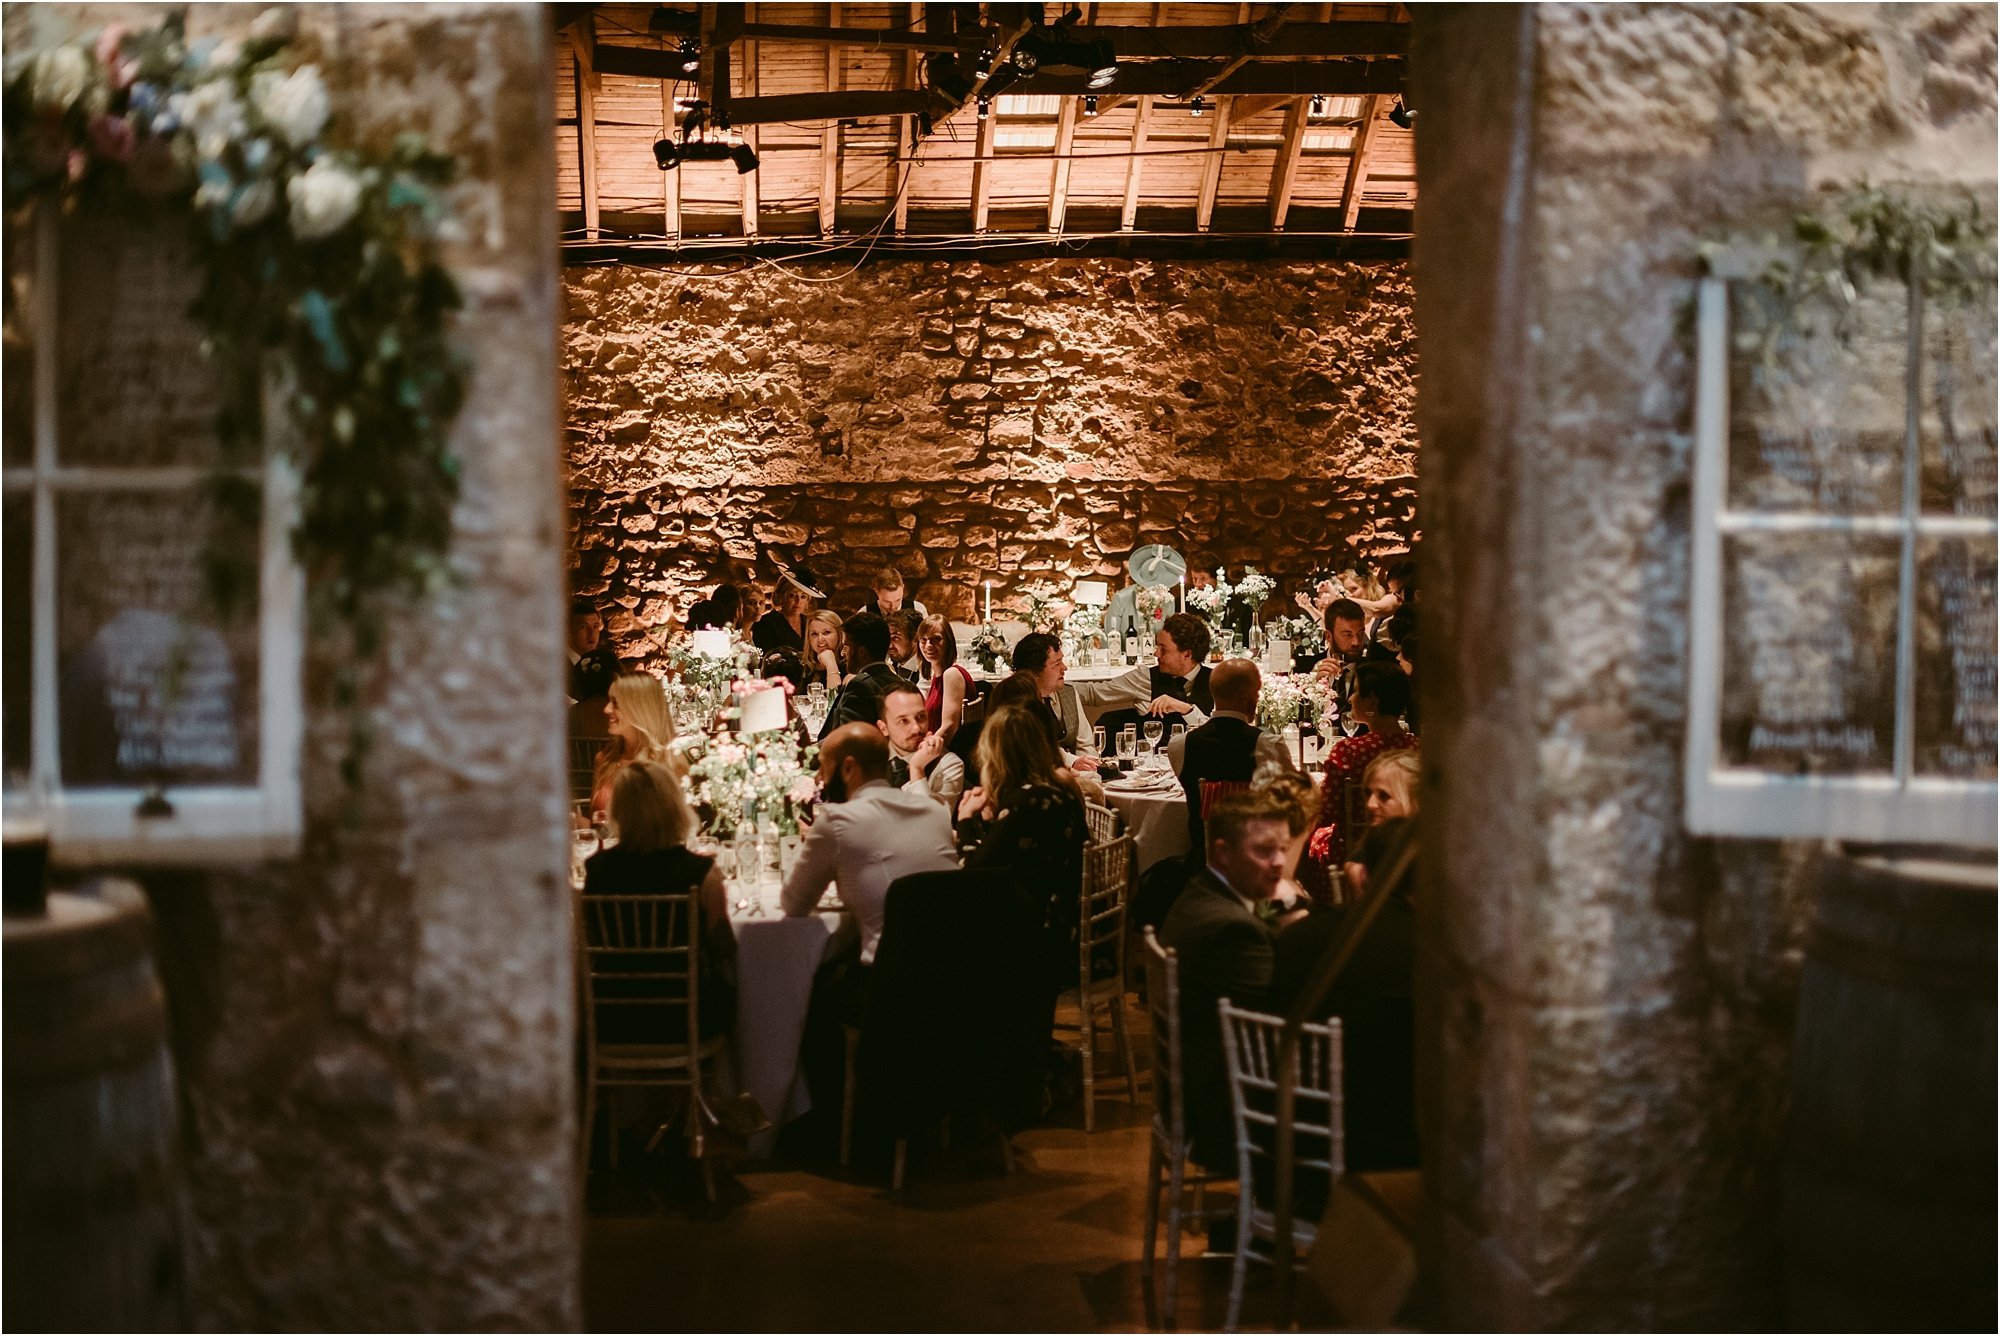 Scott+Joanna-Kinkell-Byre-wedding-fife-photography__0075.jpg